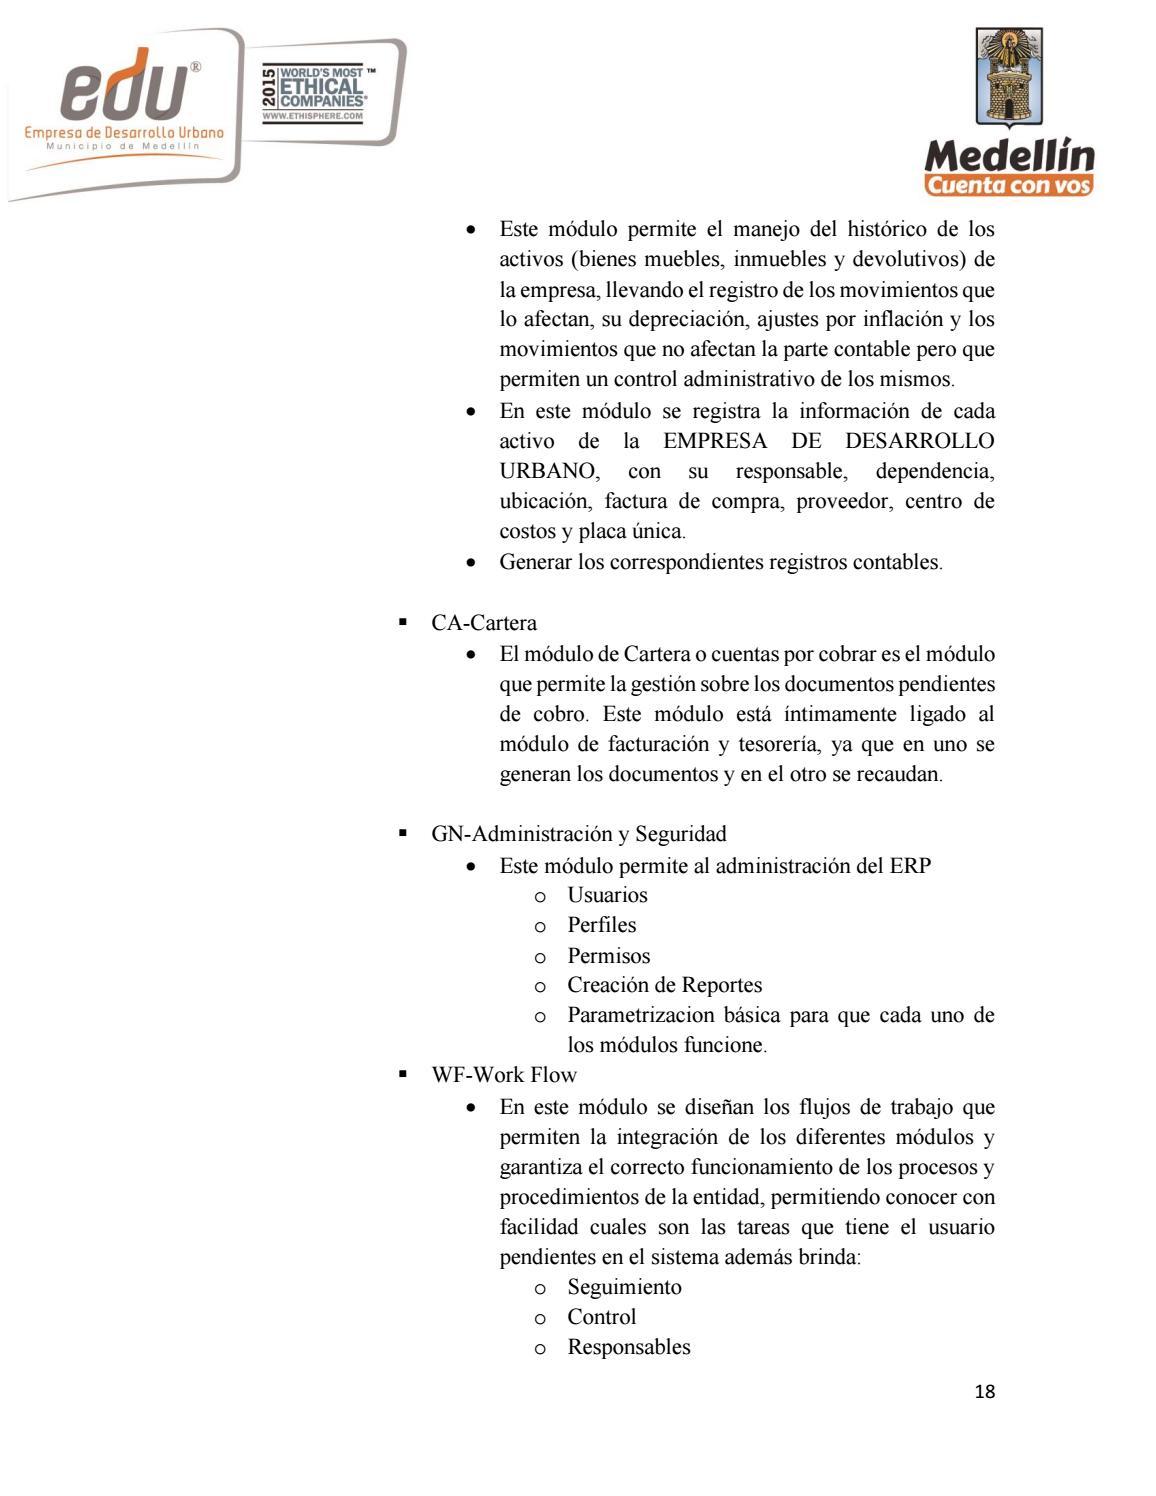 Plan Estratégico De Tecnología Peti Empresa De